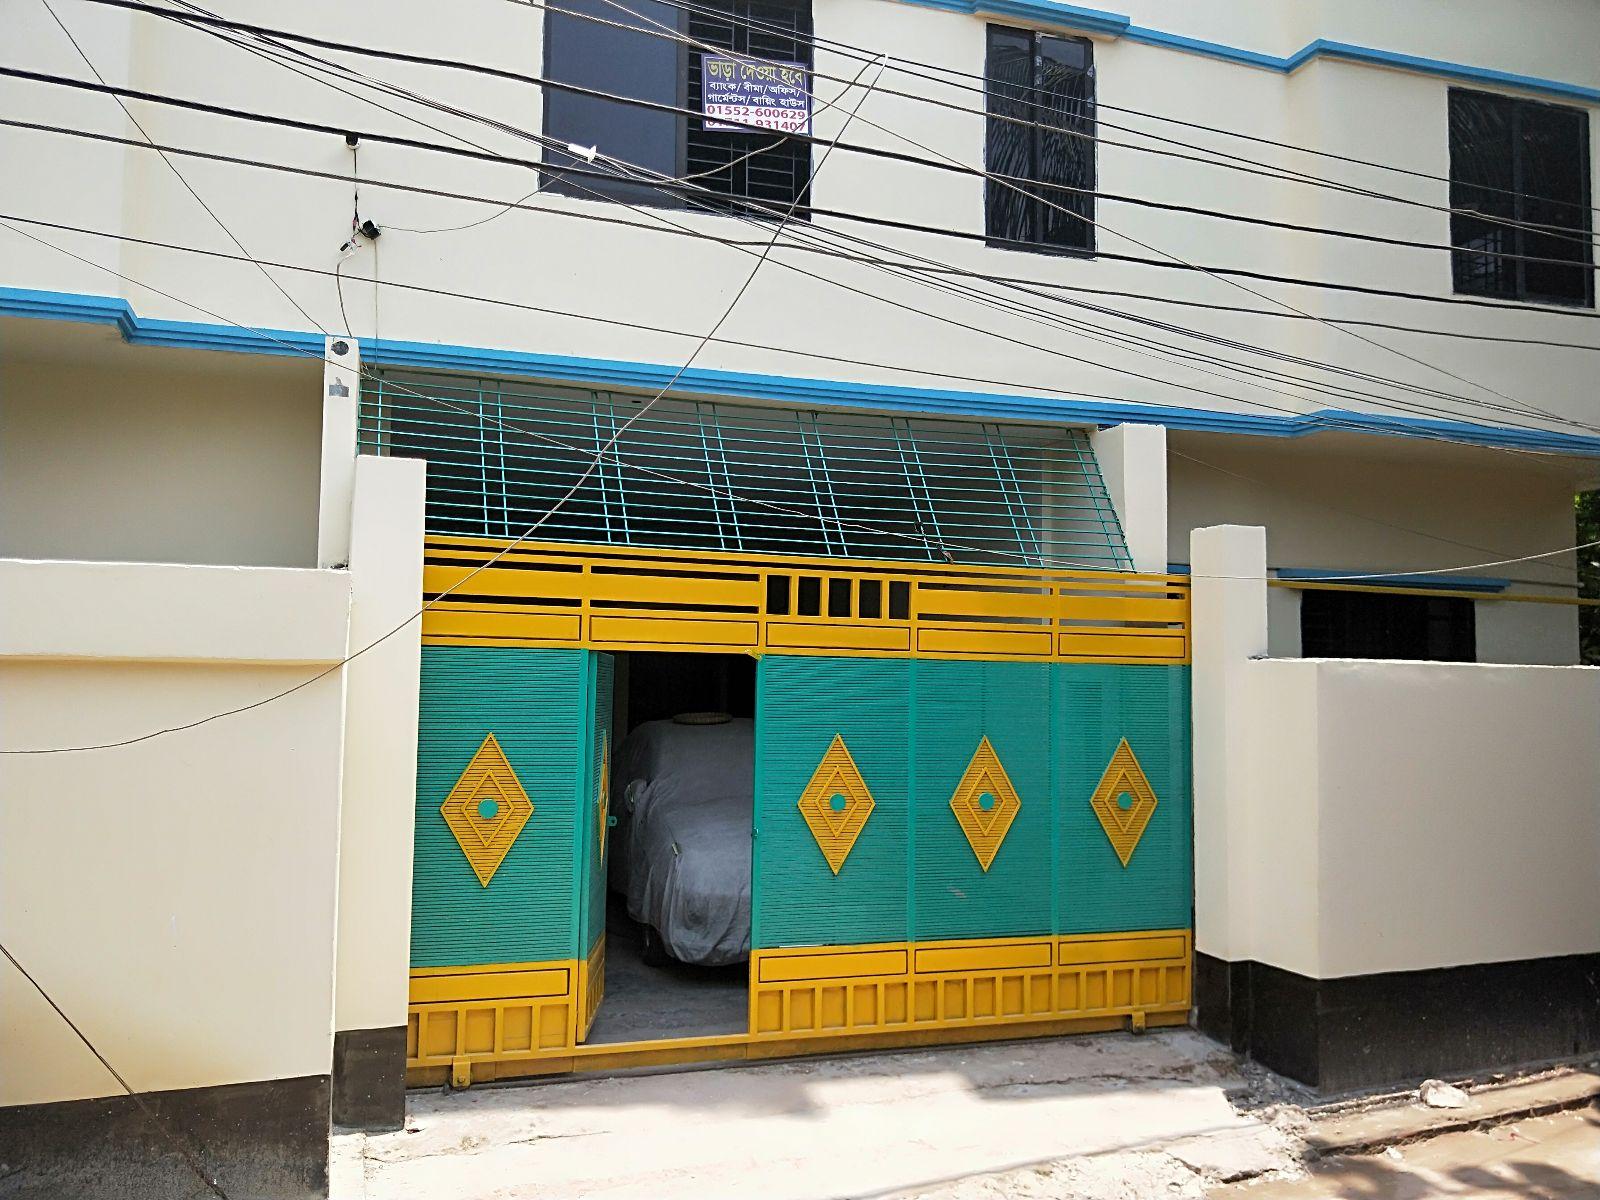 Office rent in Dhaka উত্তরা, চালাবন, চৈতি গার্মেন্টস এর দক্ষিণে, ভার্সেটাইল গার্মেন্টসের পশ্চিম পাশে। উত্তরা ঢাকা 1230